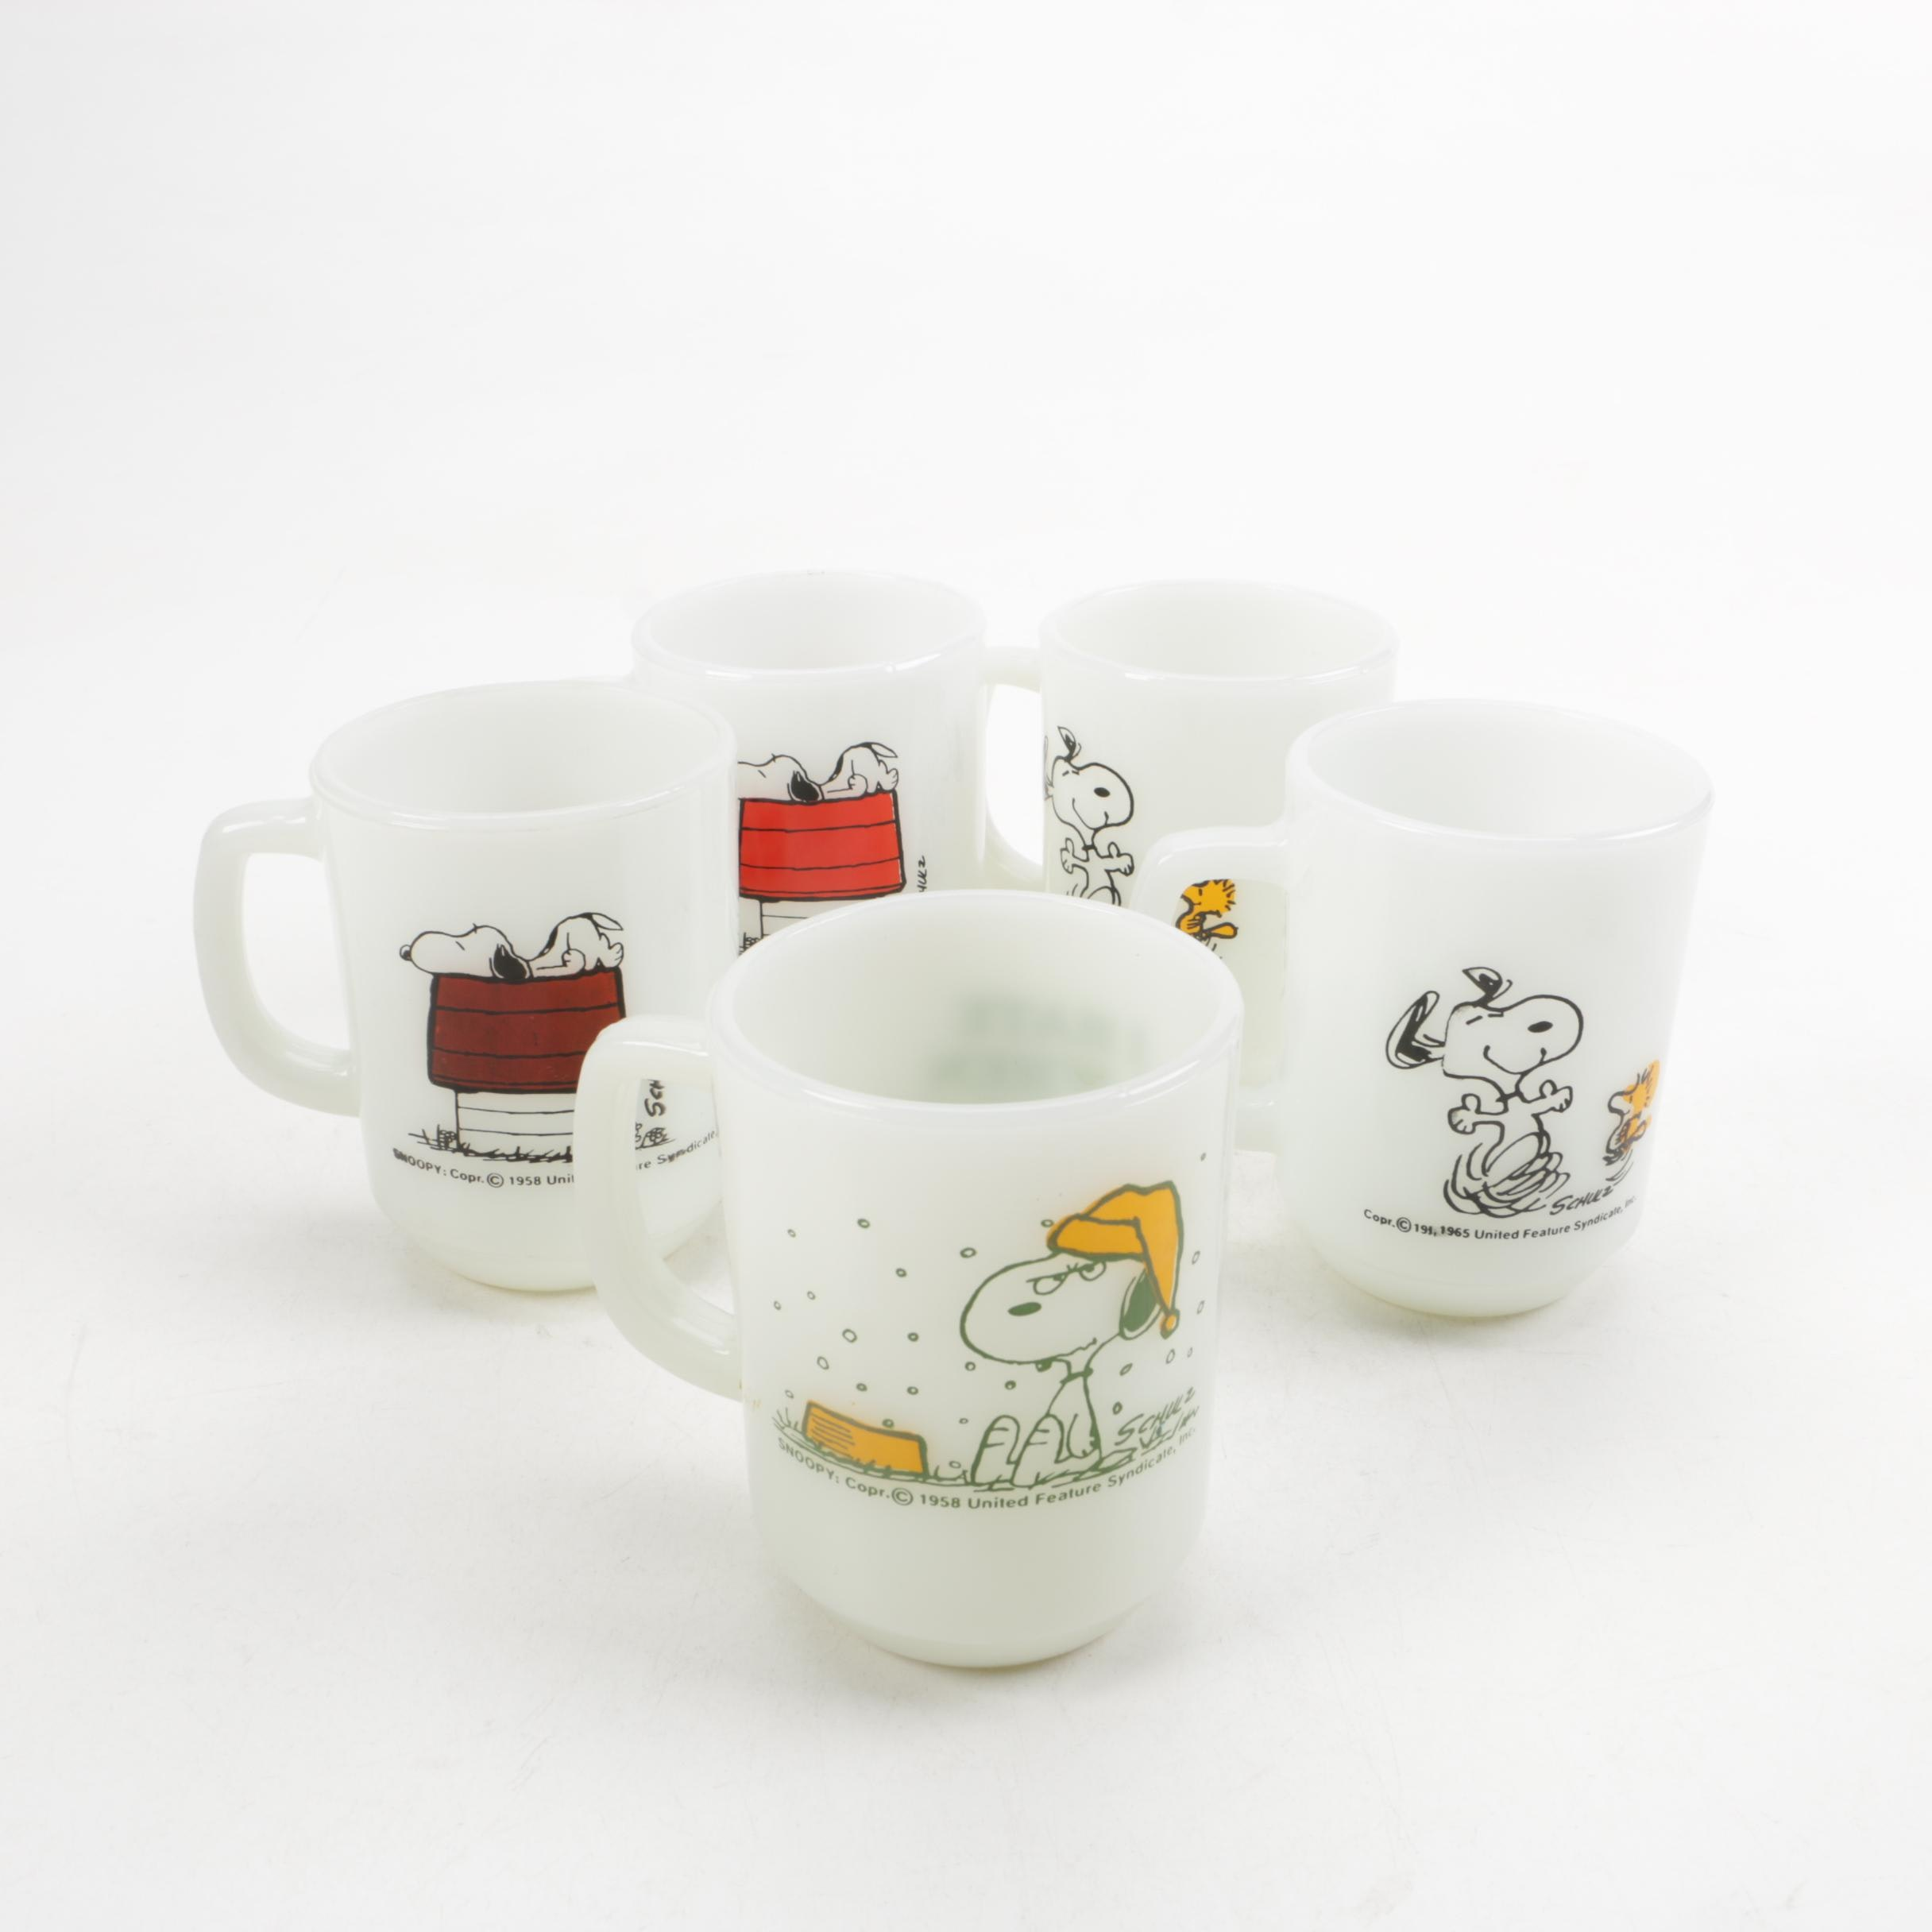 Fire-King Snoopy Themed Milk Glass Mugs